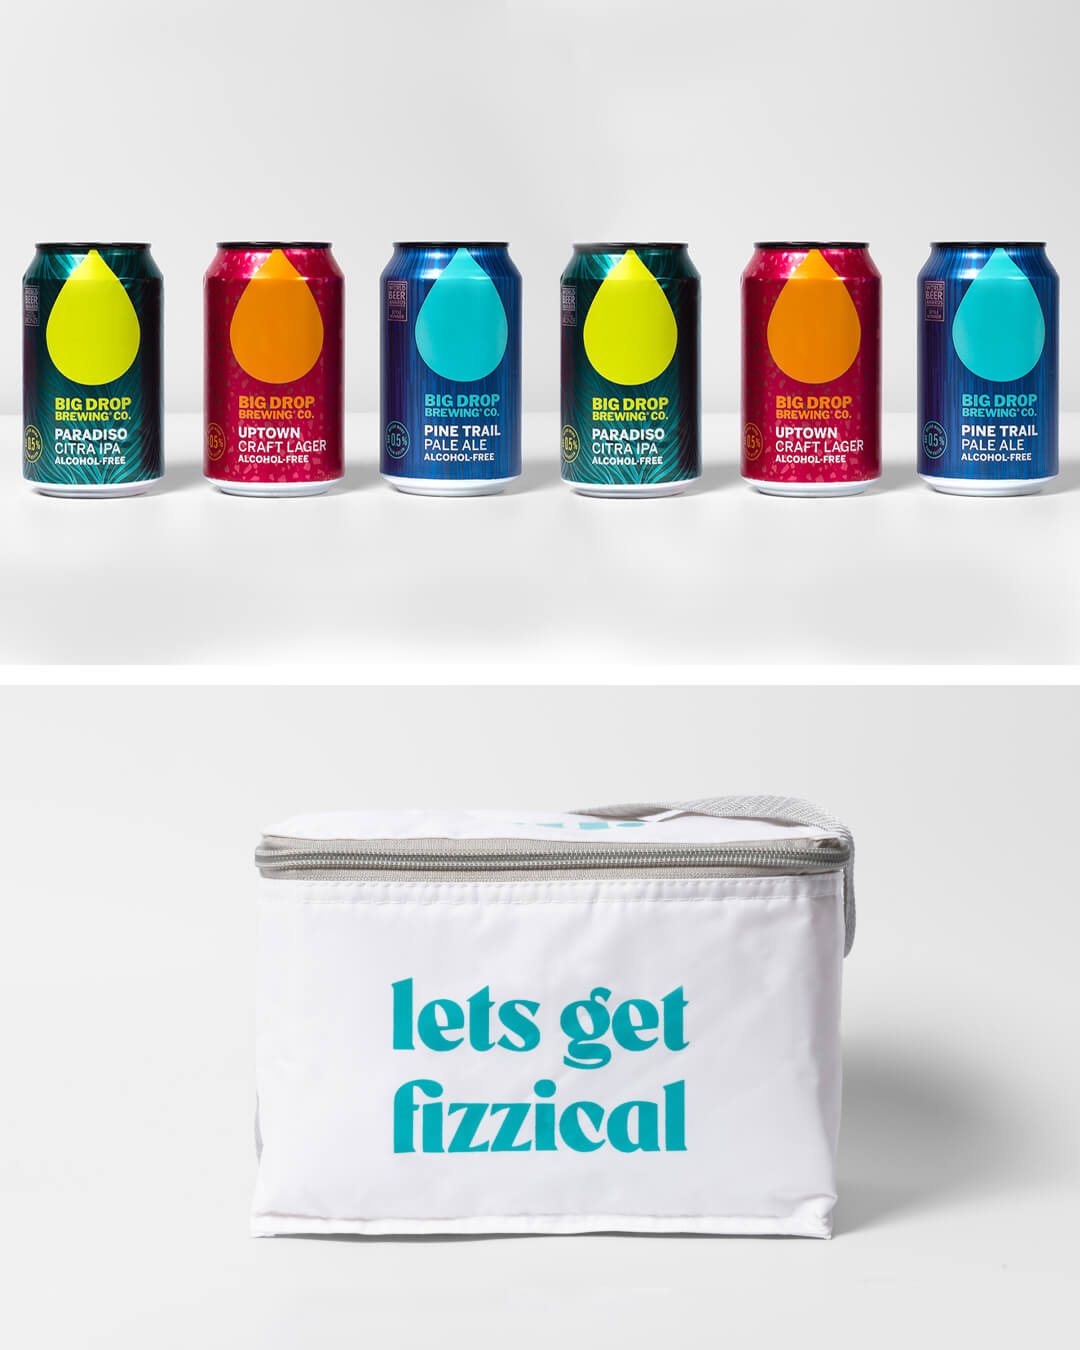 Big Drop alcohol free craft beer cans & ta. cool bag